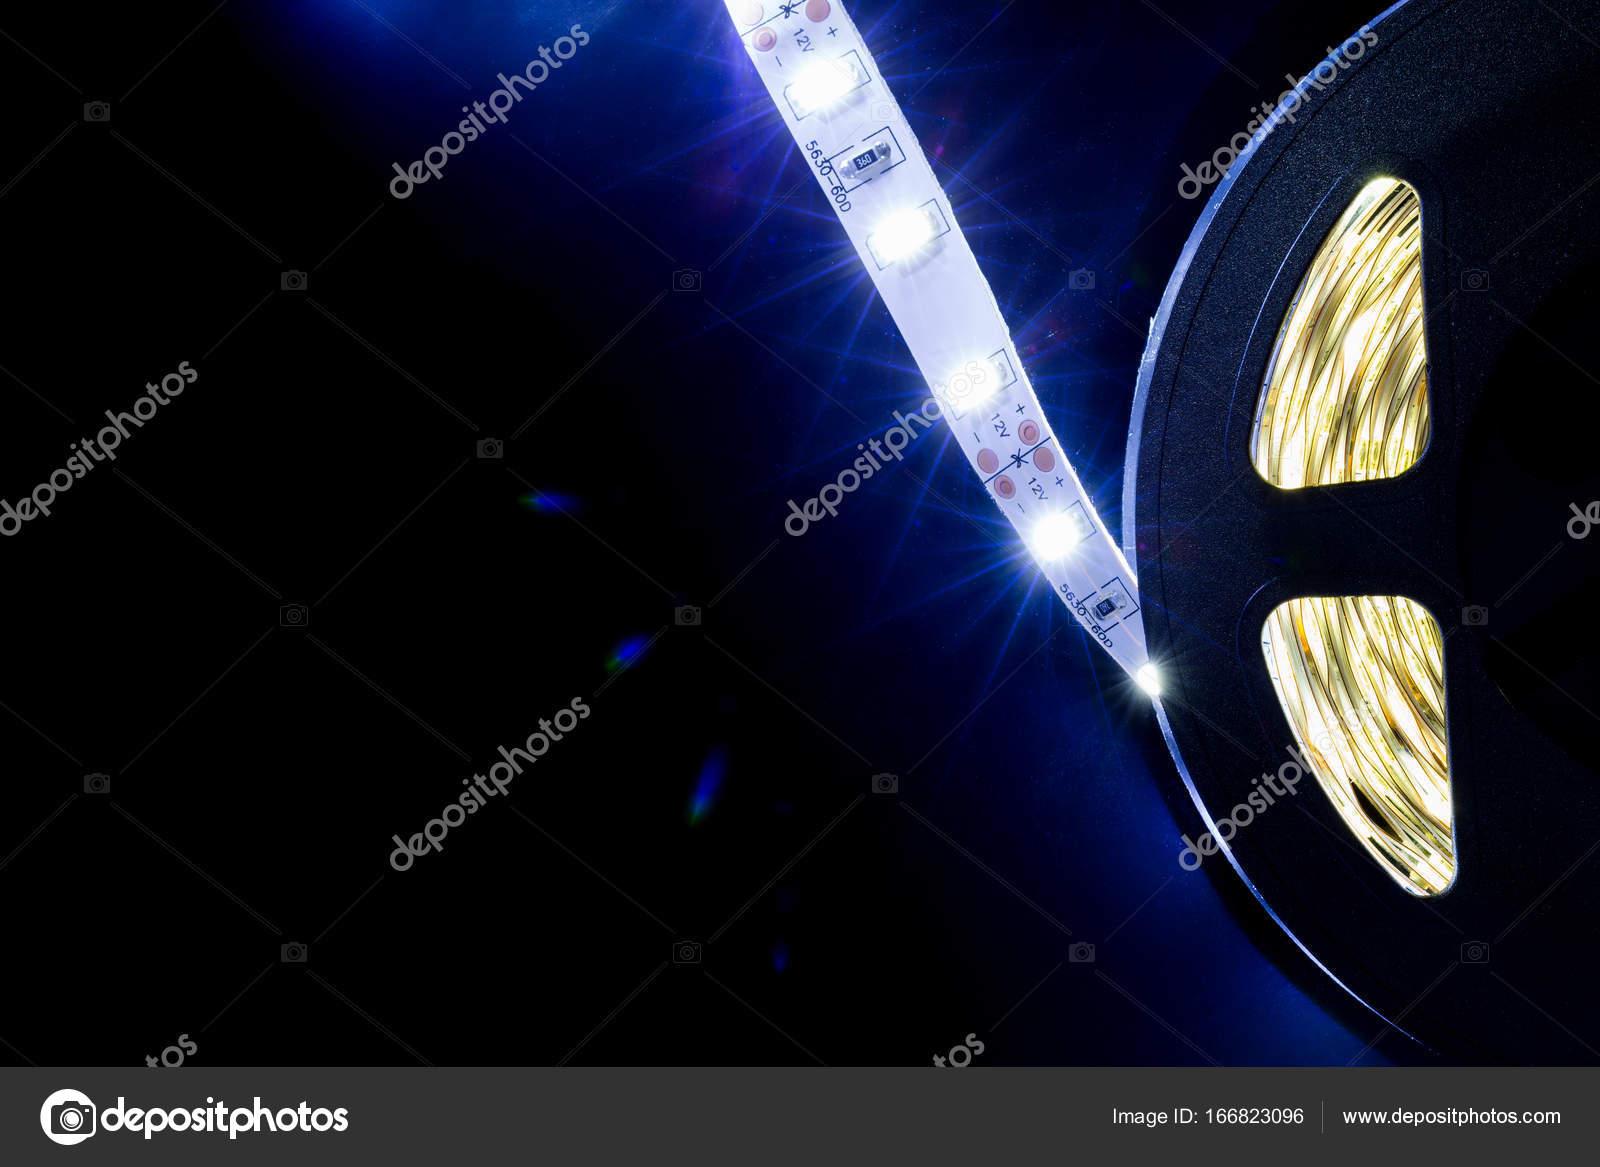 Led strip light stock photo studio306stock 166823096 diode strip led lights tape close up photo by studio306stock aloadofball Gallery